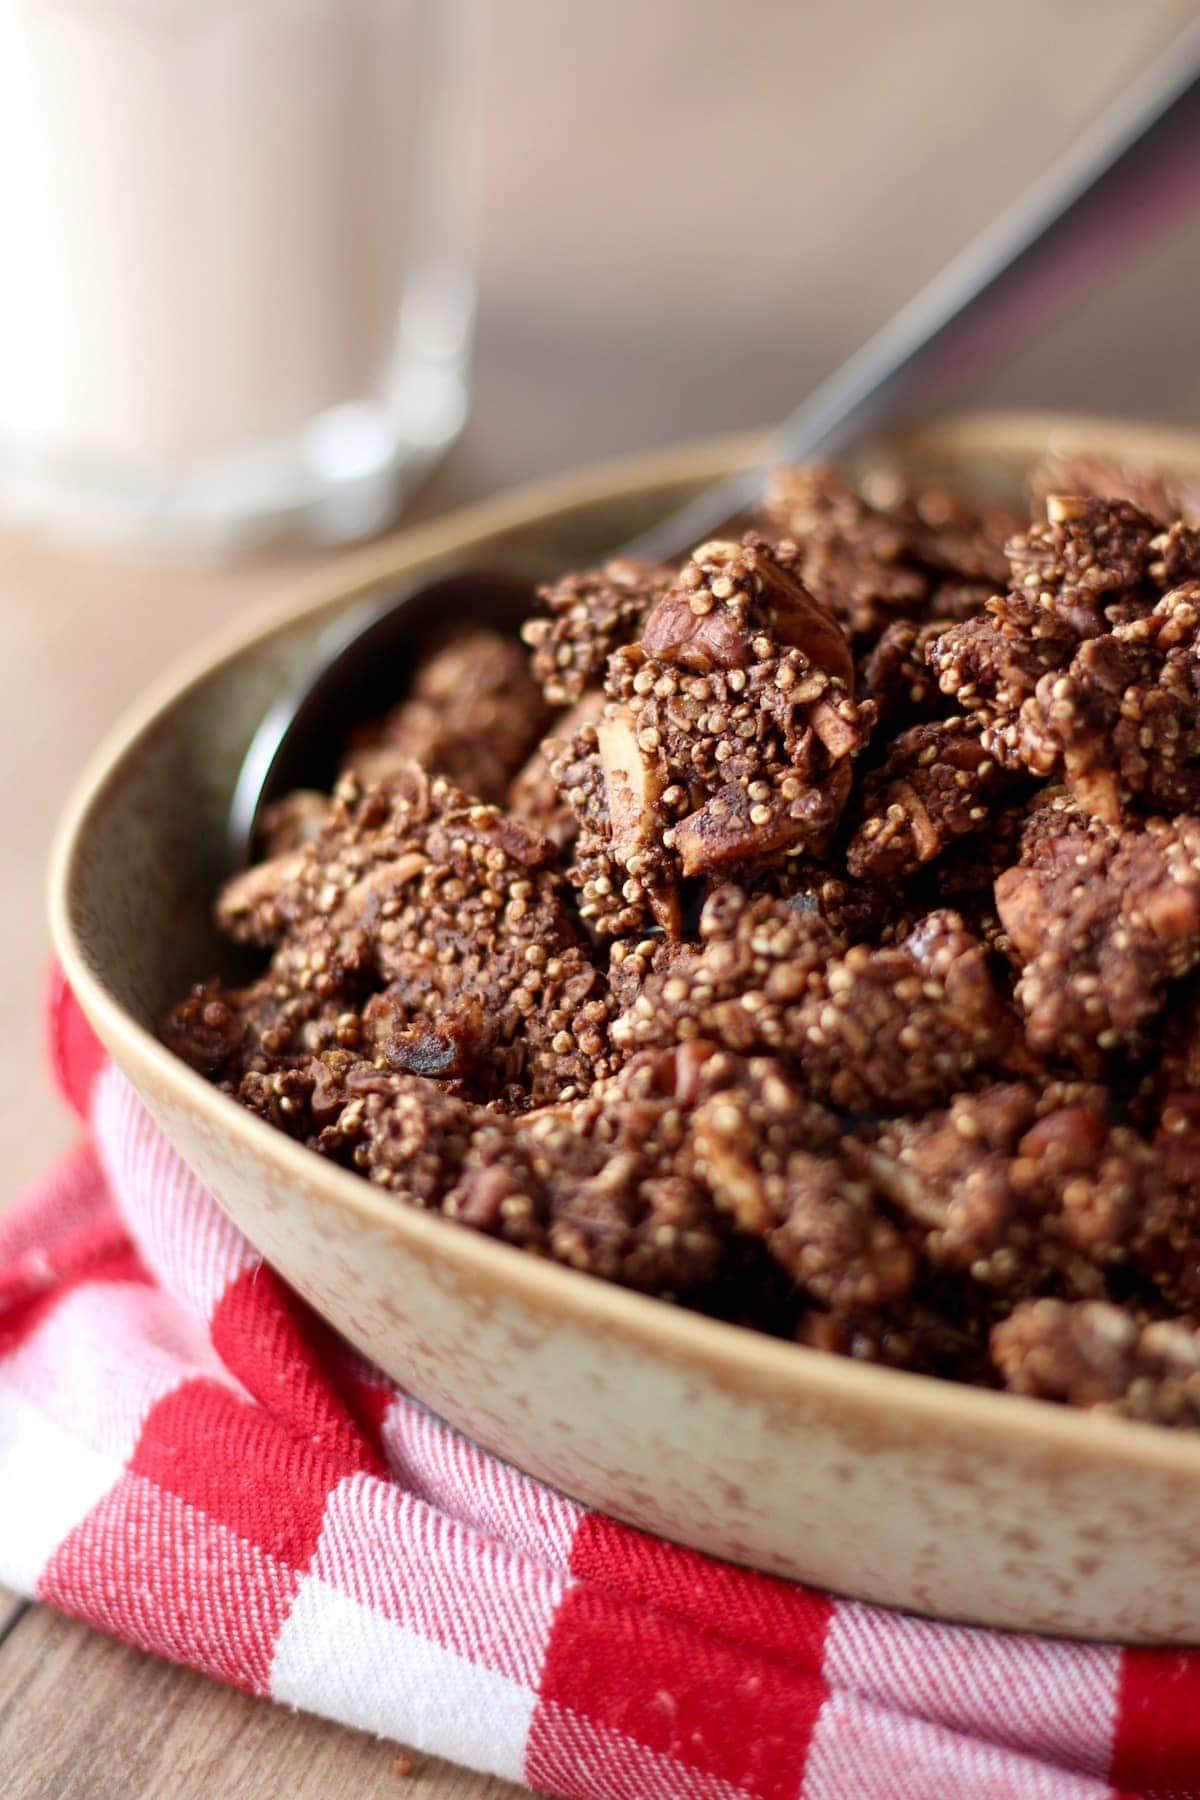 chocolate quinoa granola piled high in a bowl